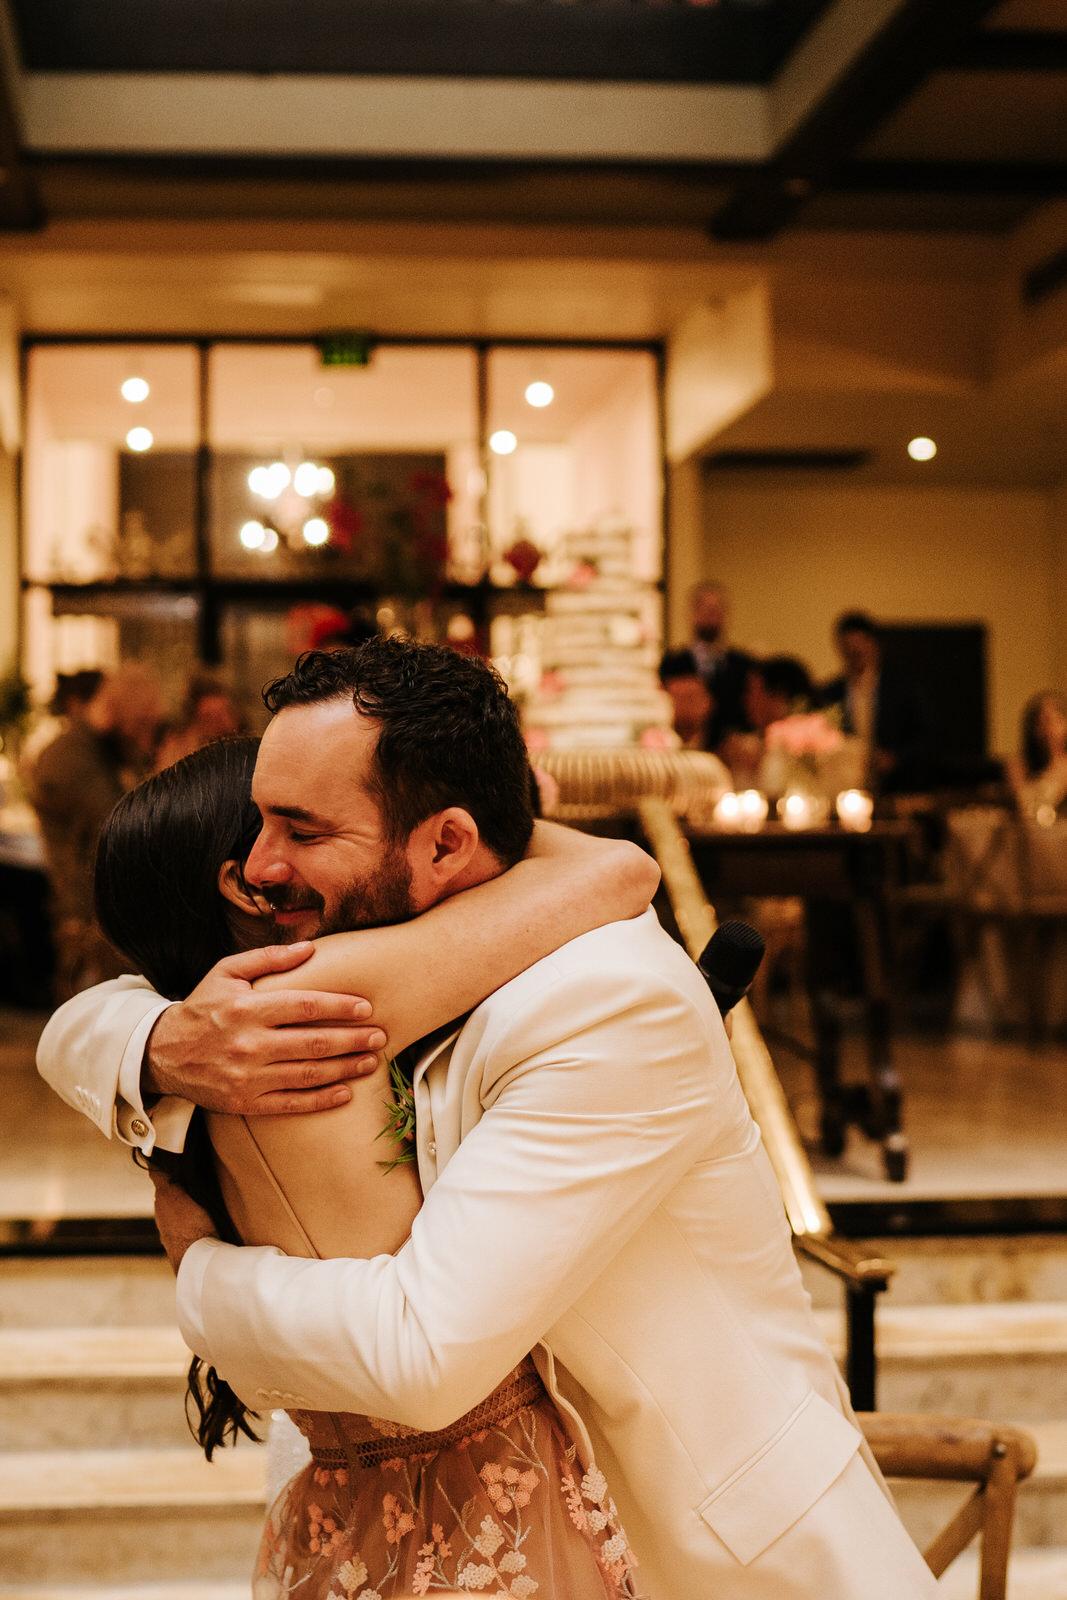 Groom hugs bride's best friend after she finishes her wedding speech